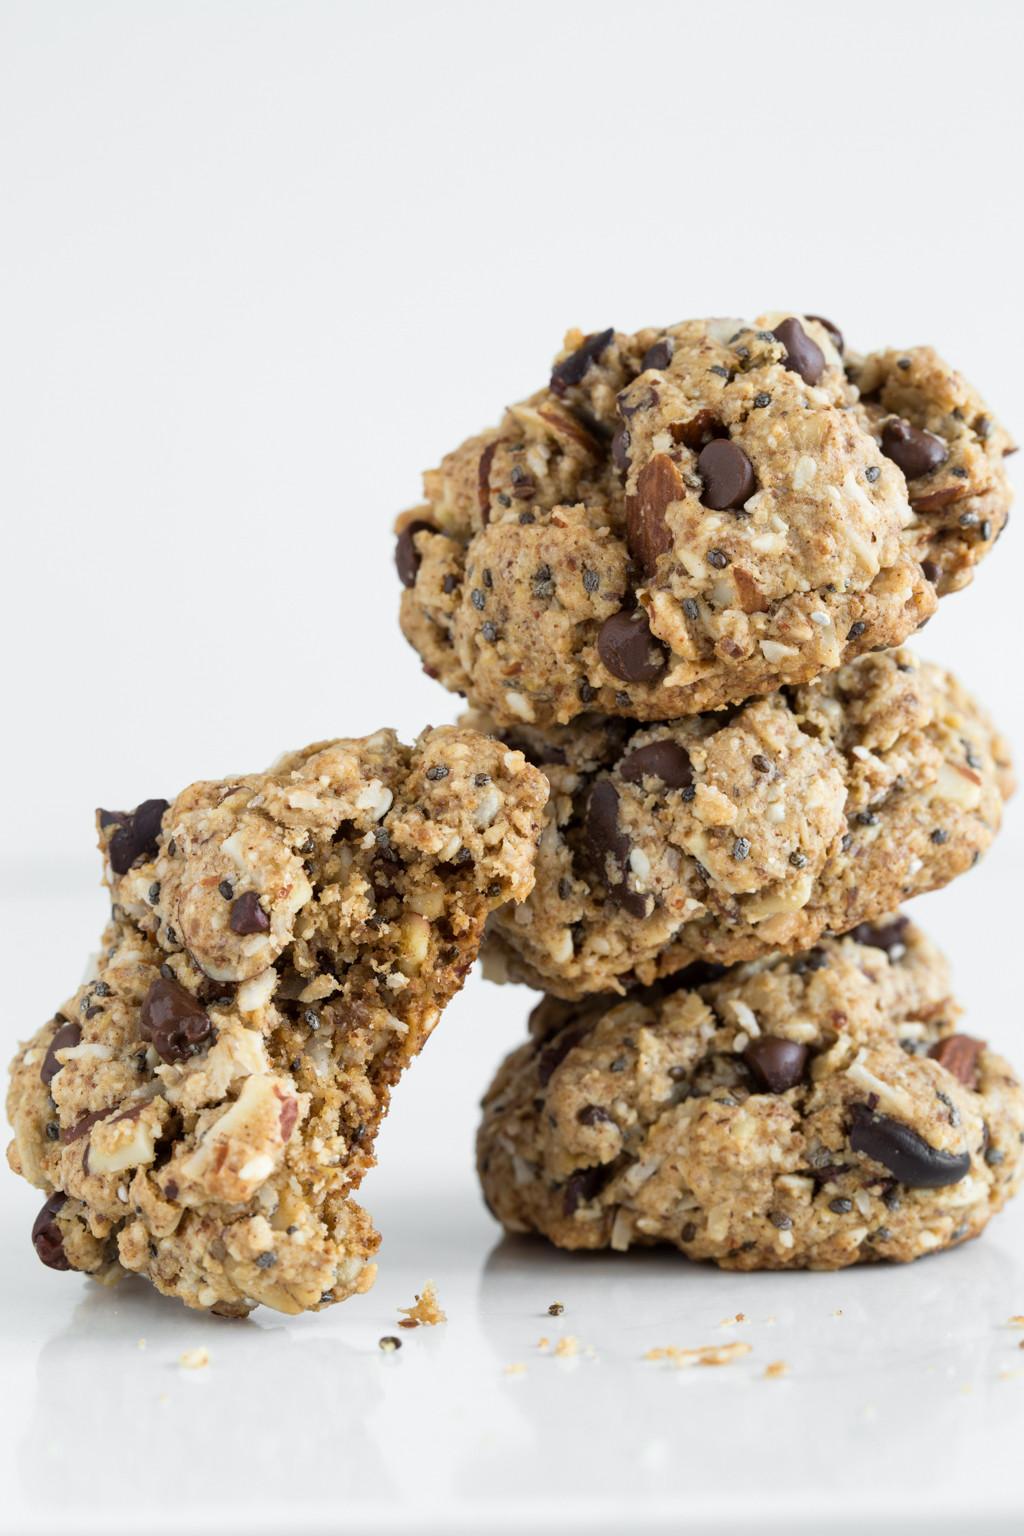 Vegan Peanut Butter Cookies Oh She Glows  vegan peanut butter cookies oh she glows